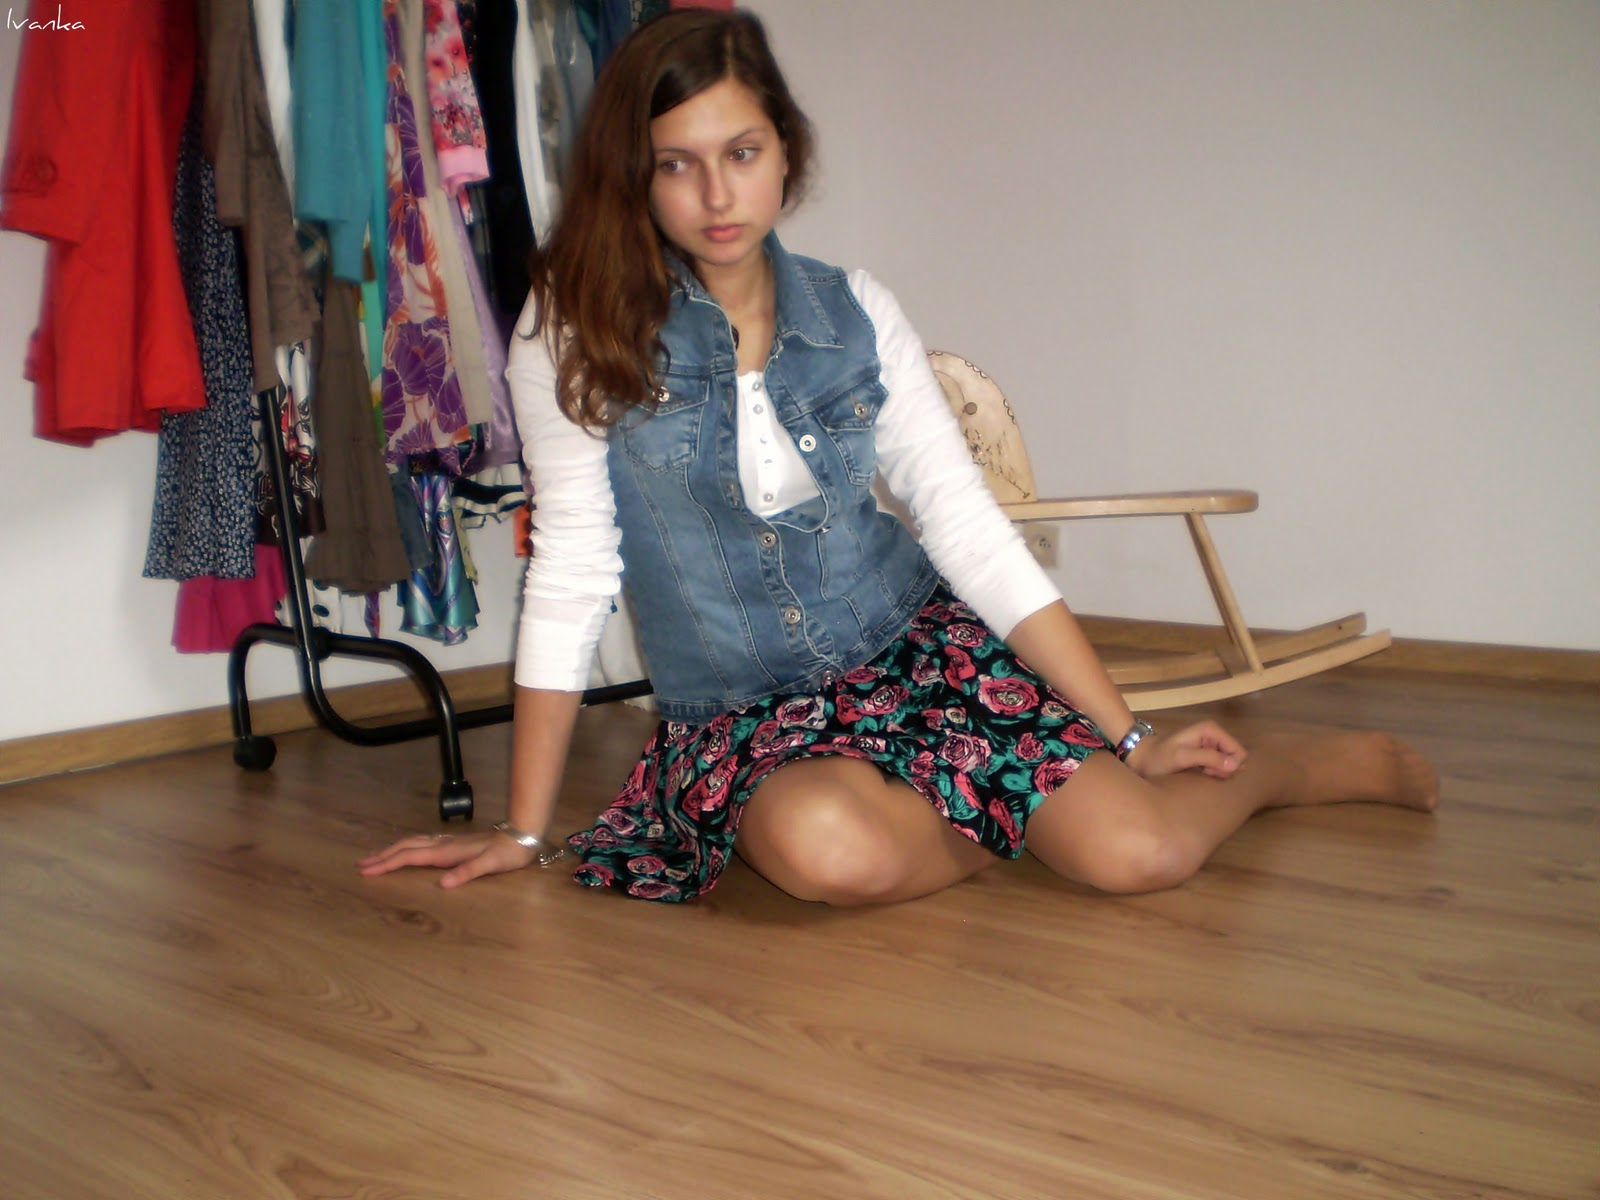 Skirt Pantyhose Pics 105